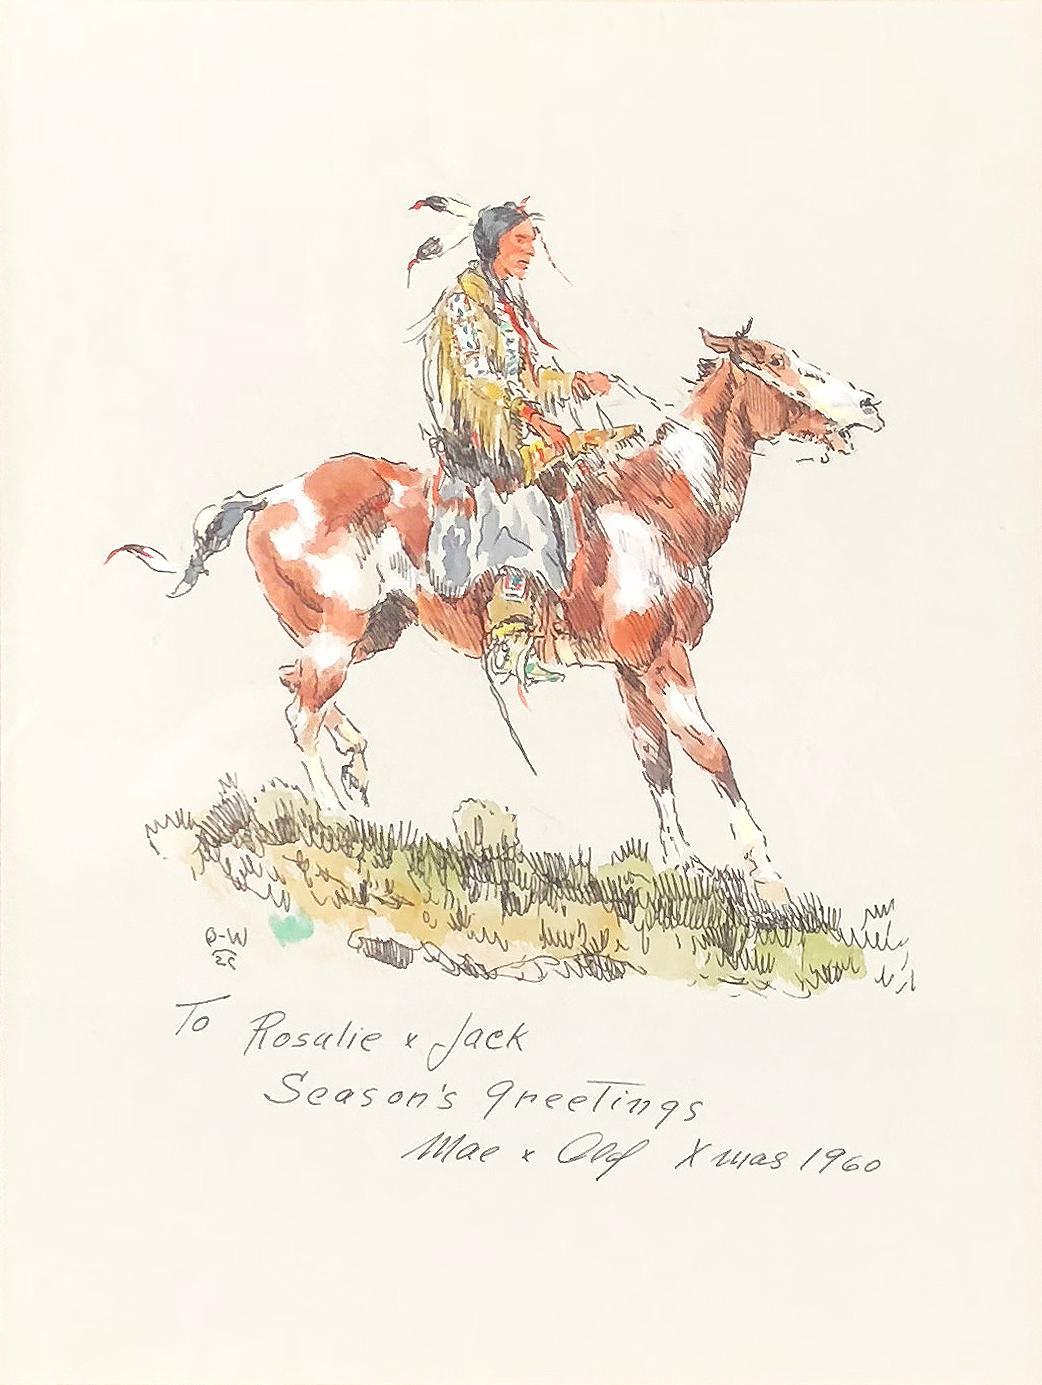 Season's Greetings 1960 (Brave on Horseback)